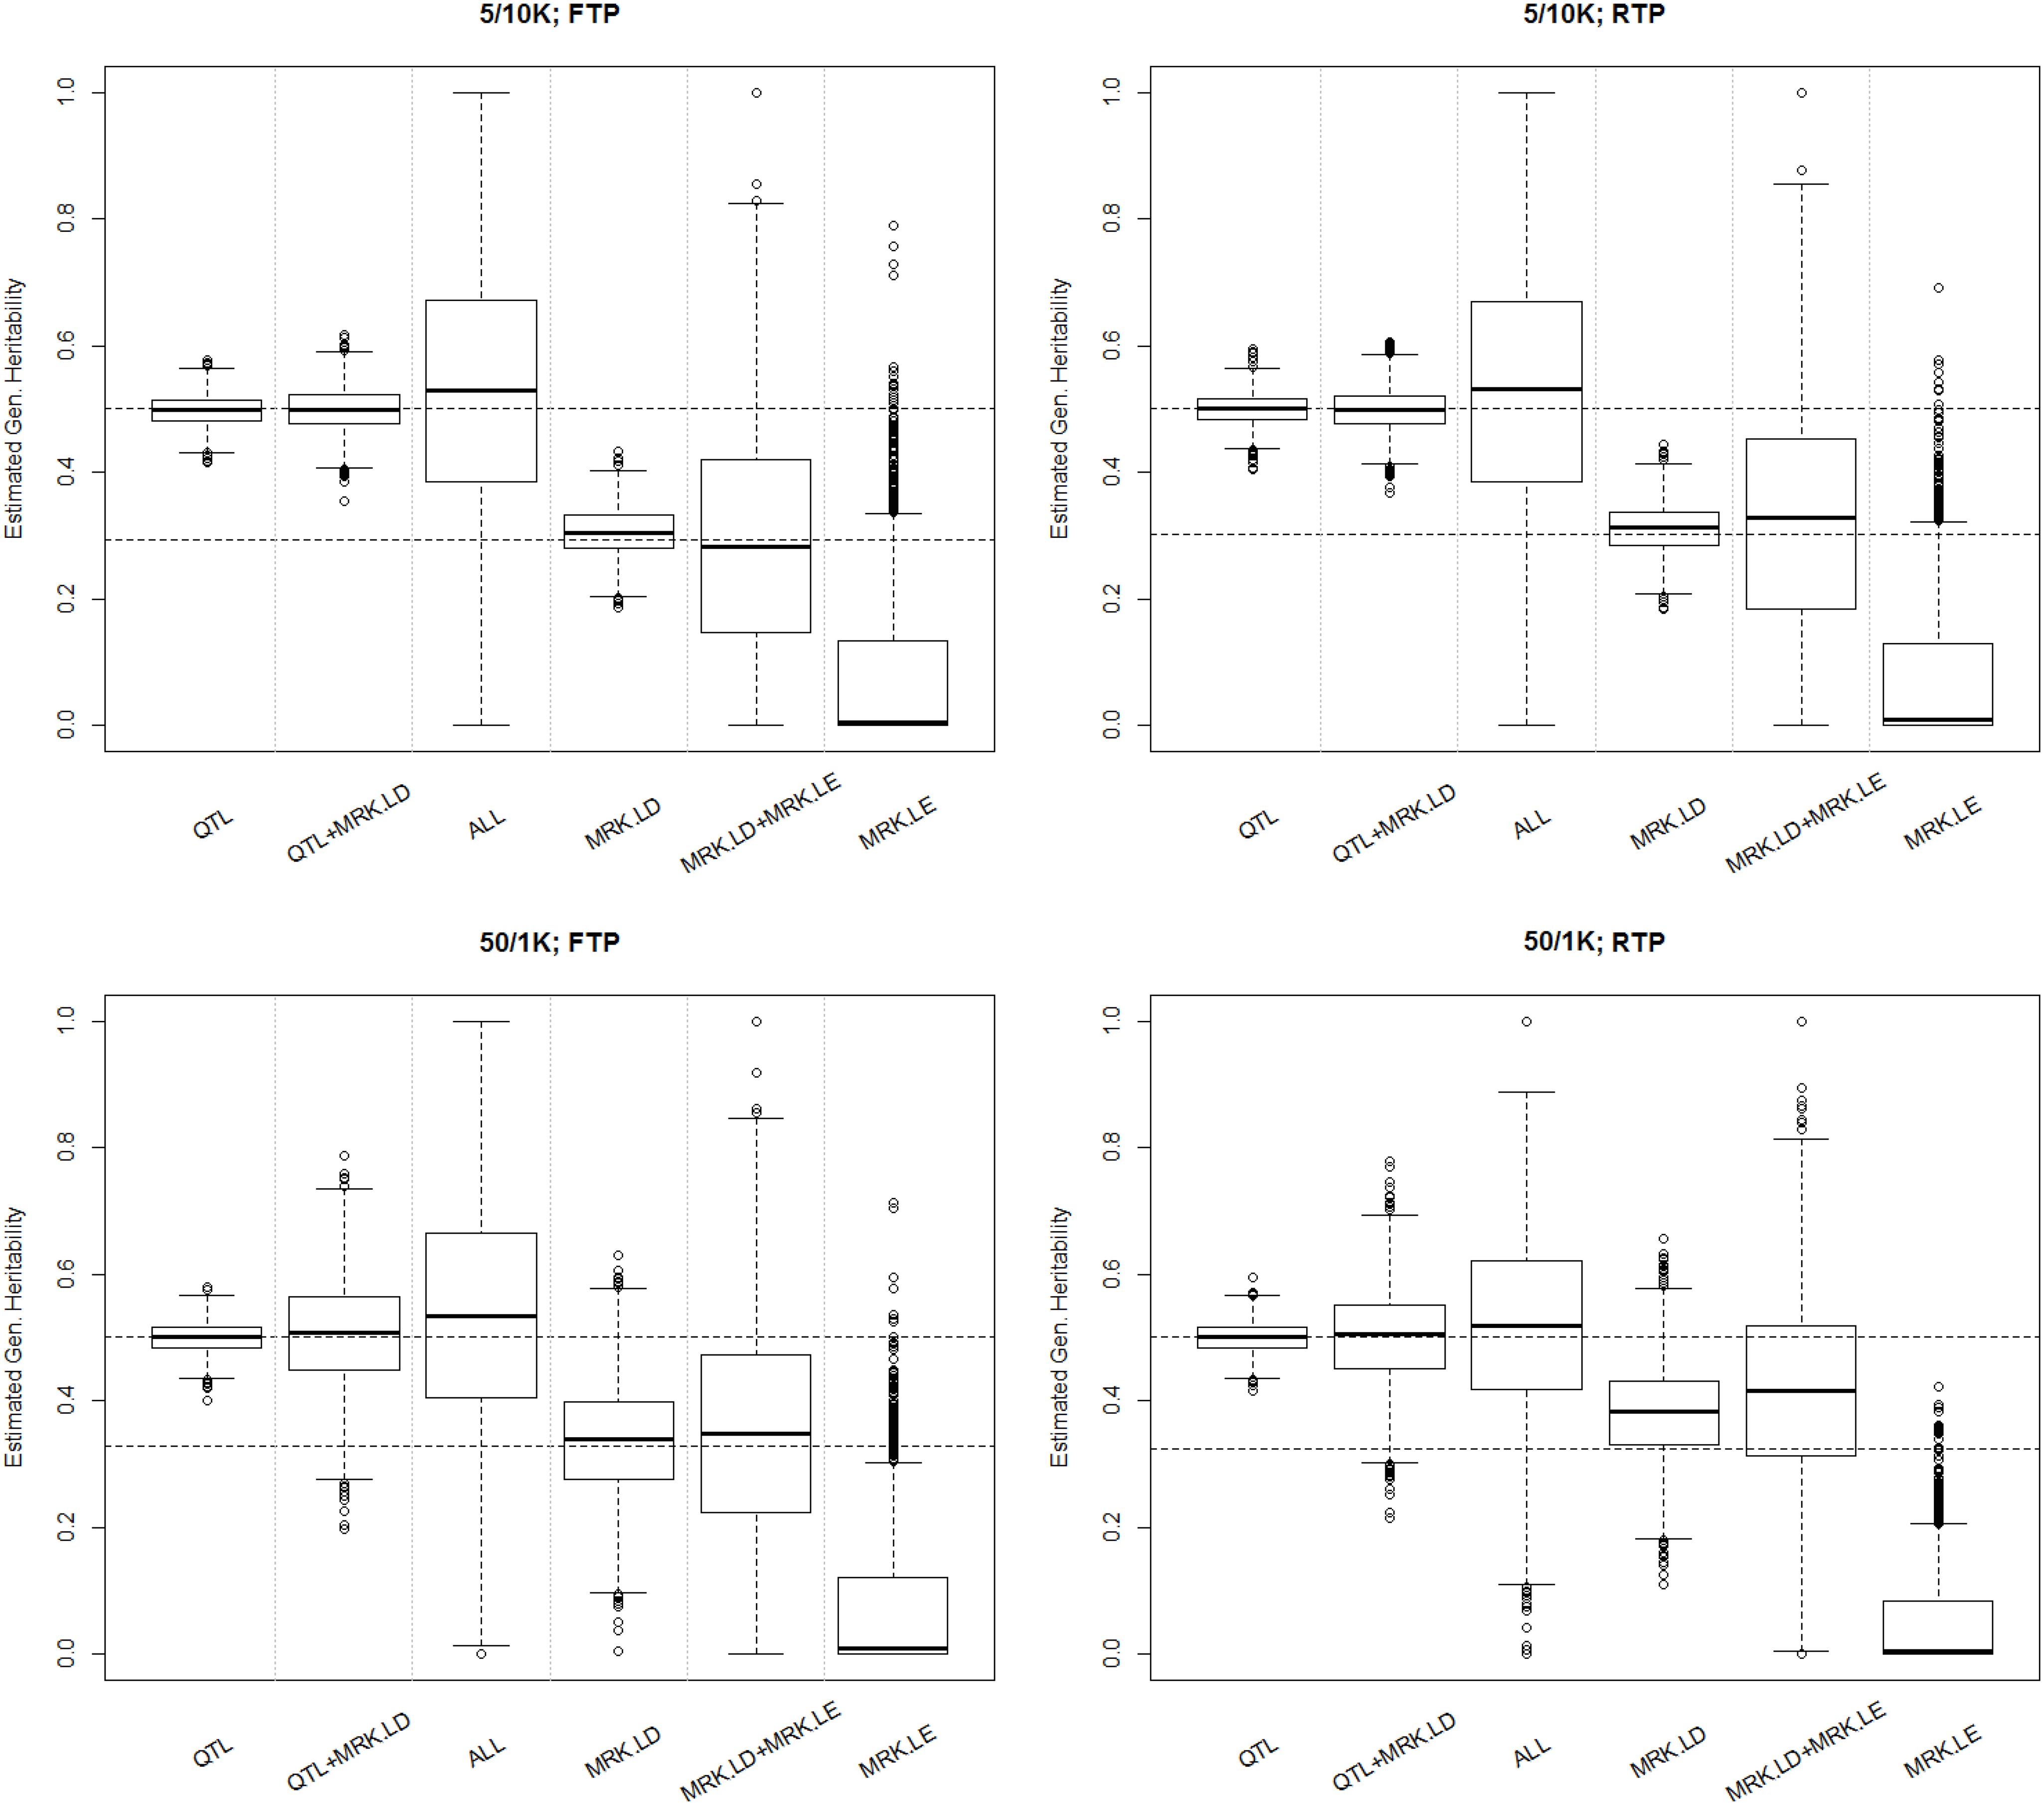 Boxplot of estimated genomic heritability (3,000 MC replicates) by simulation and analysis scenario.